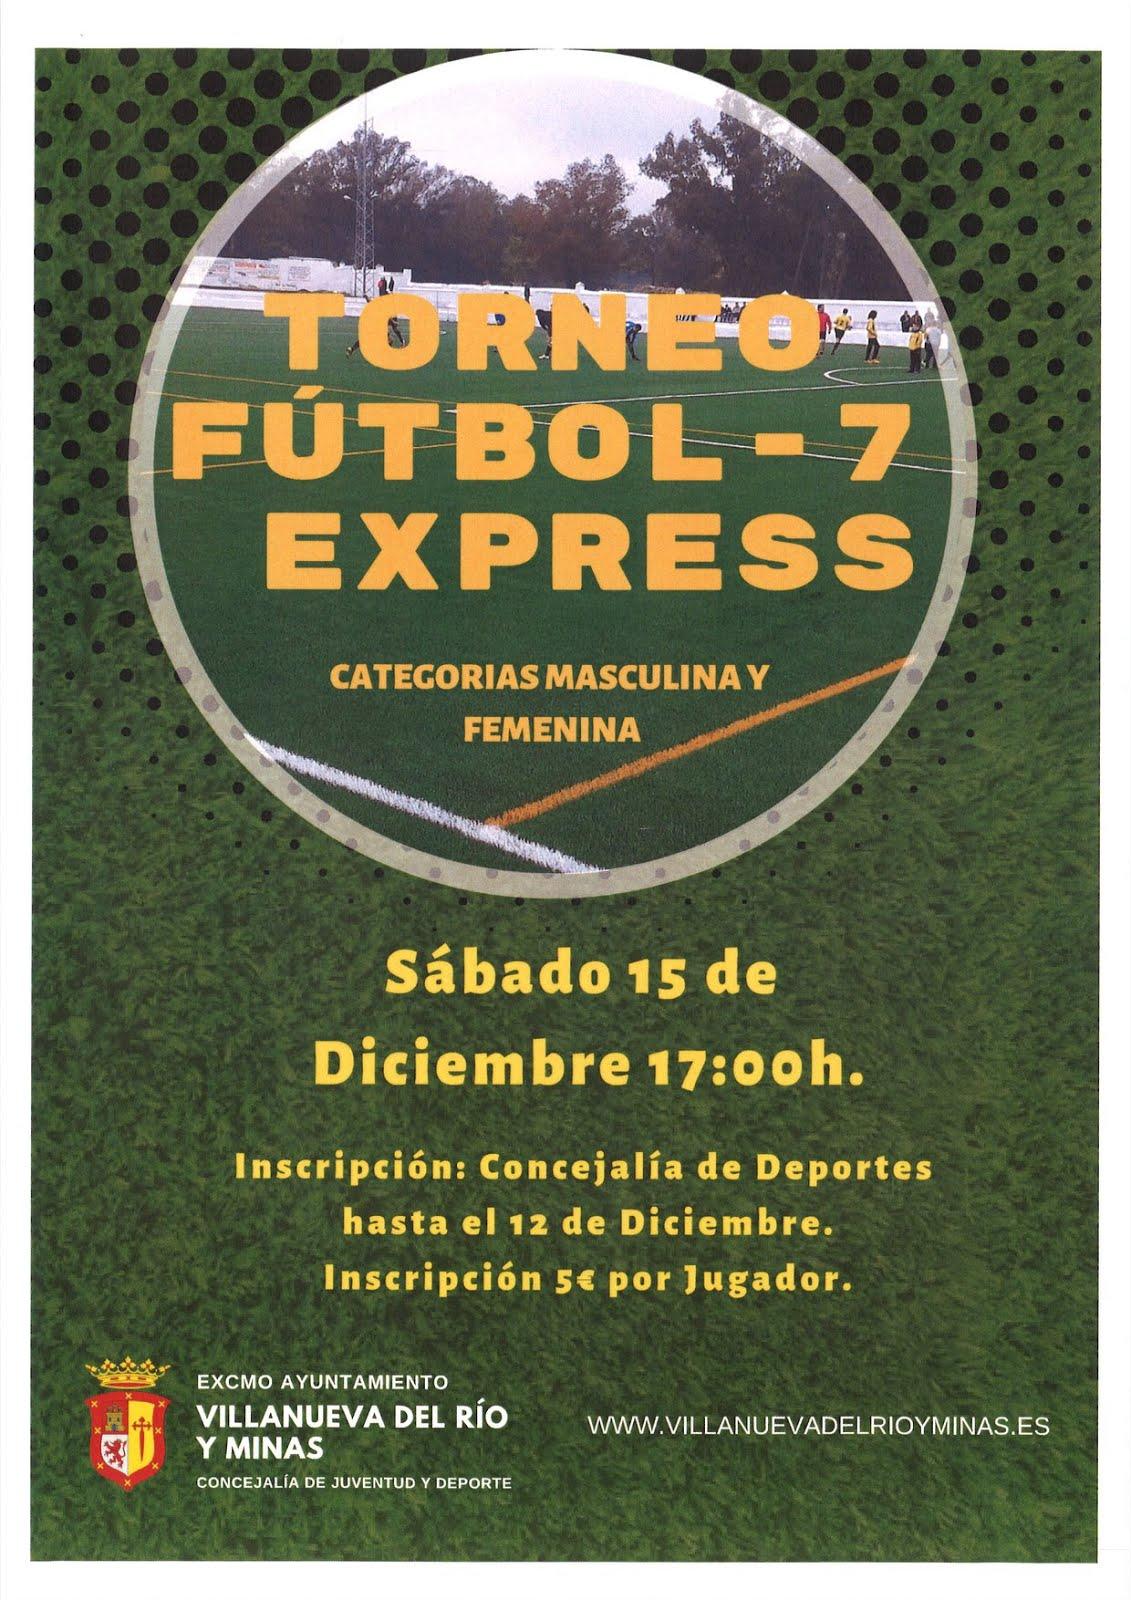 TORNEO FÚTBOL-7 EXPRESS